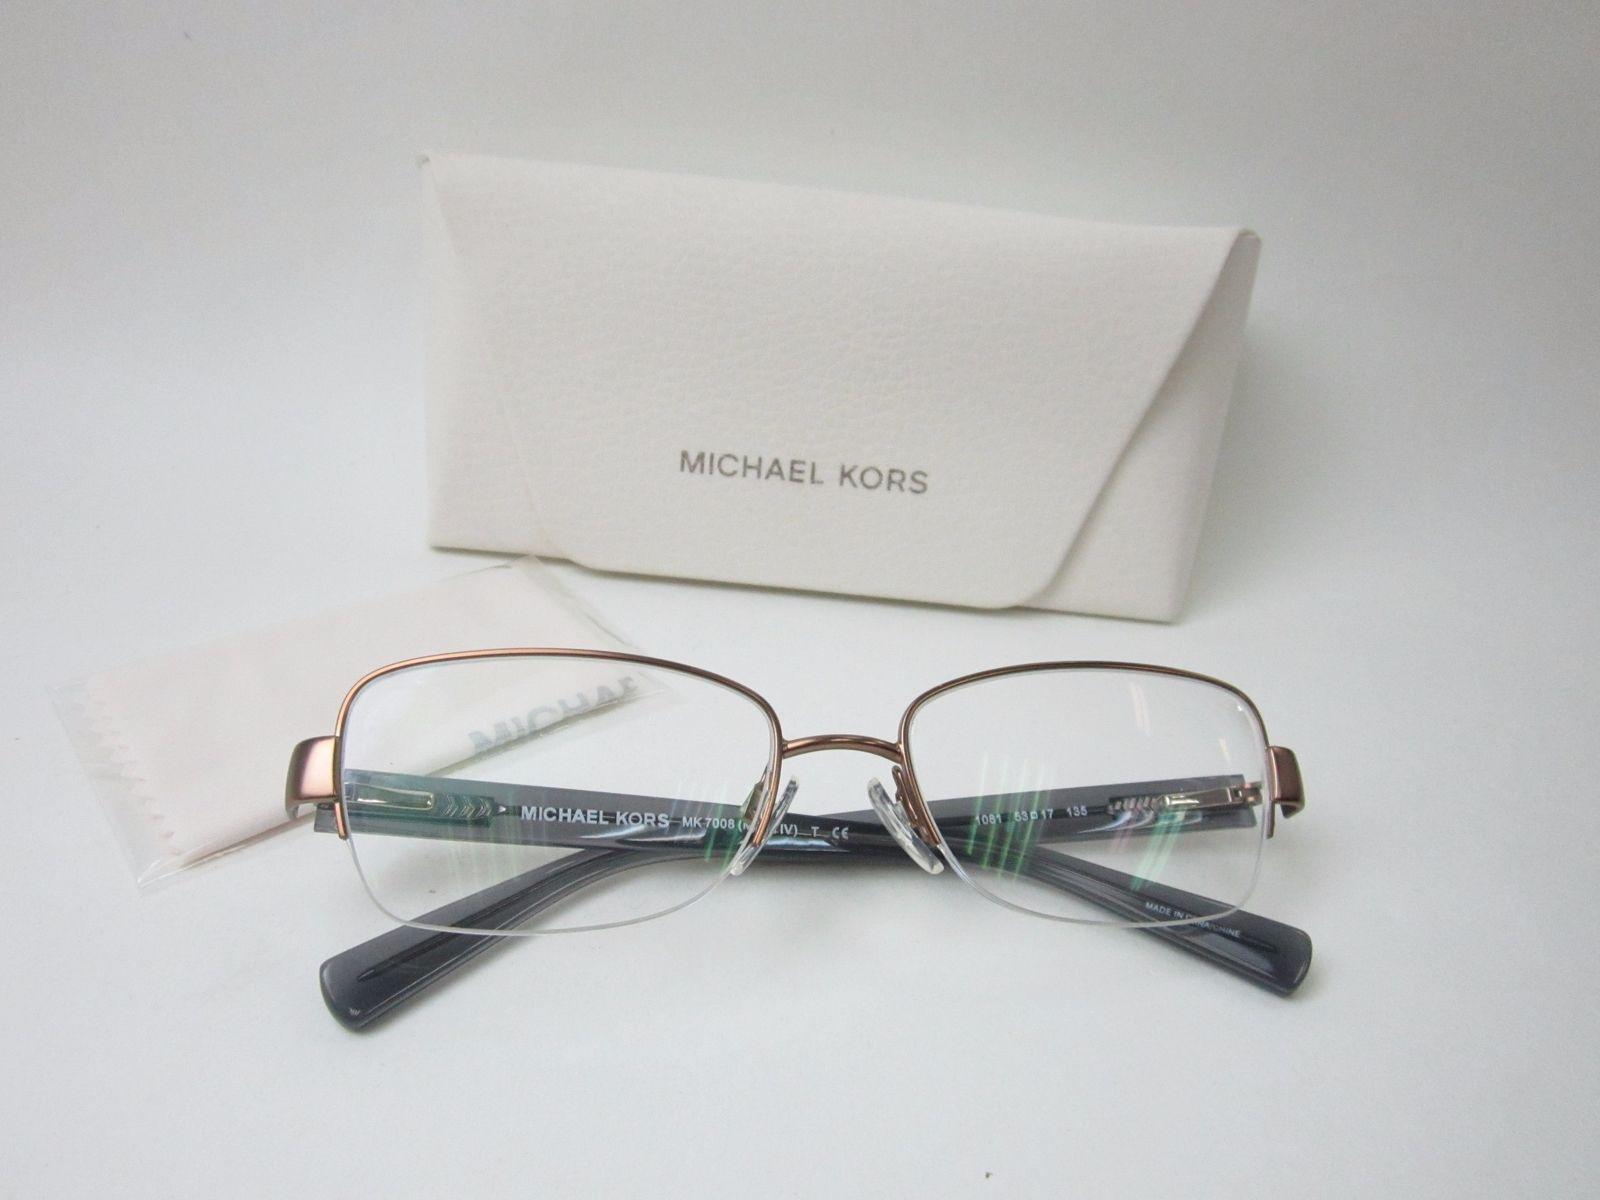 589fb2a69b AUTHENTIC! Michael Kors MK7008 1081 Women s Eyeglasses 53 17 135  SHH235